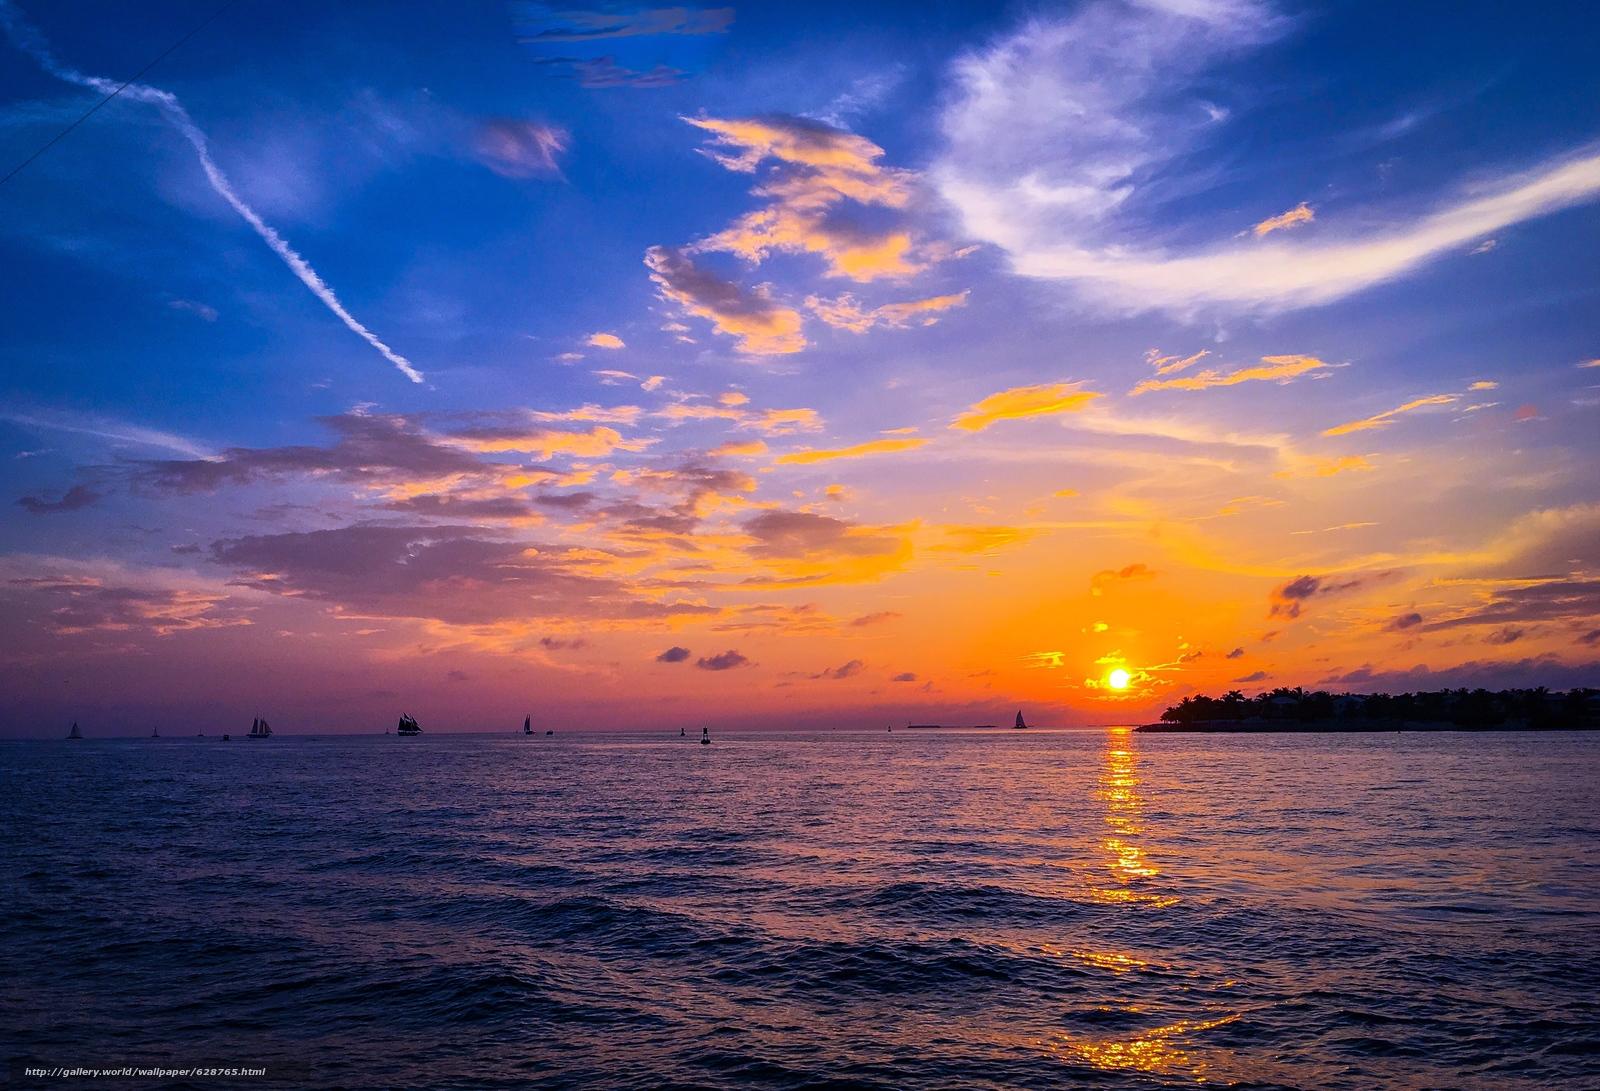 закат, море, парусники, пейзаж